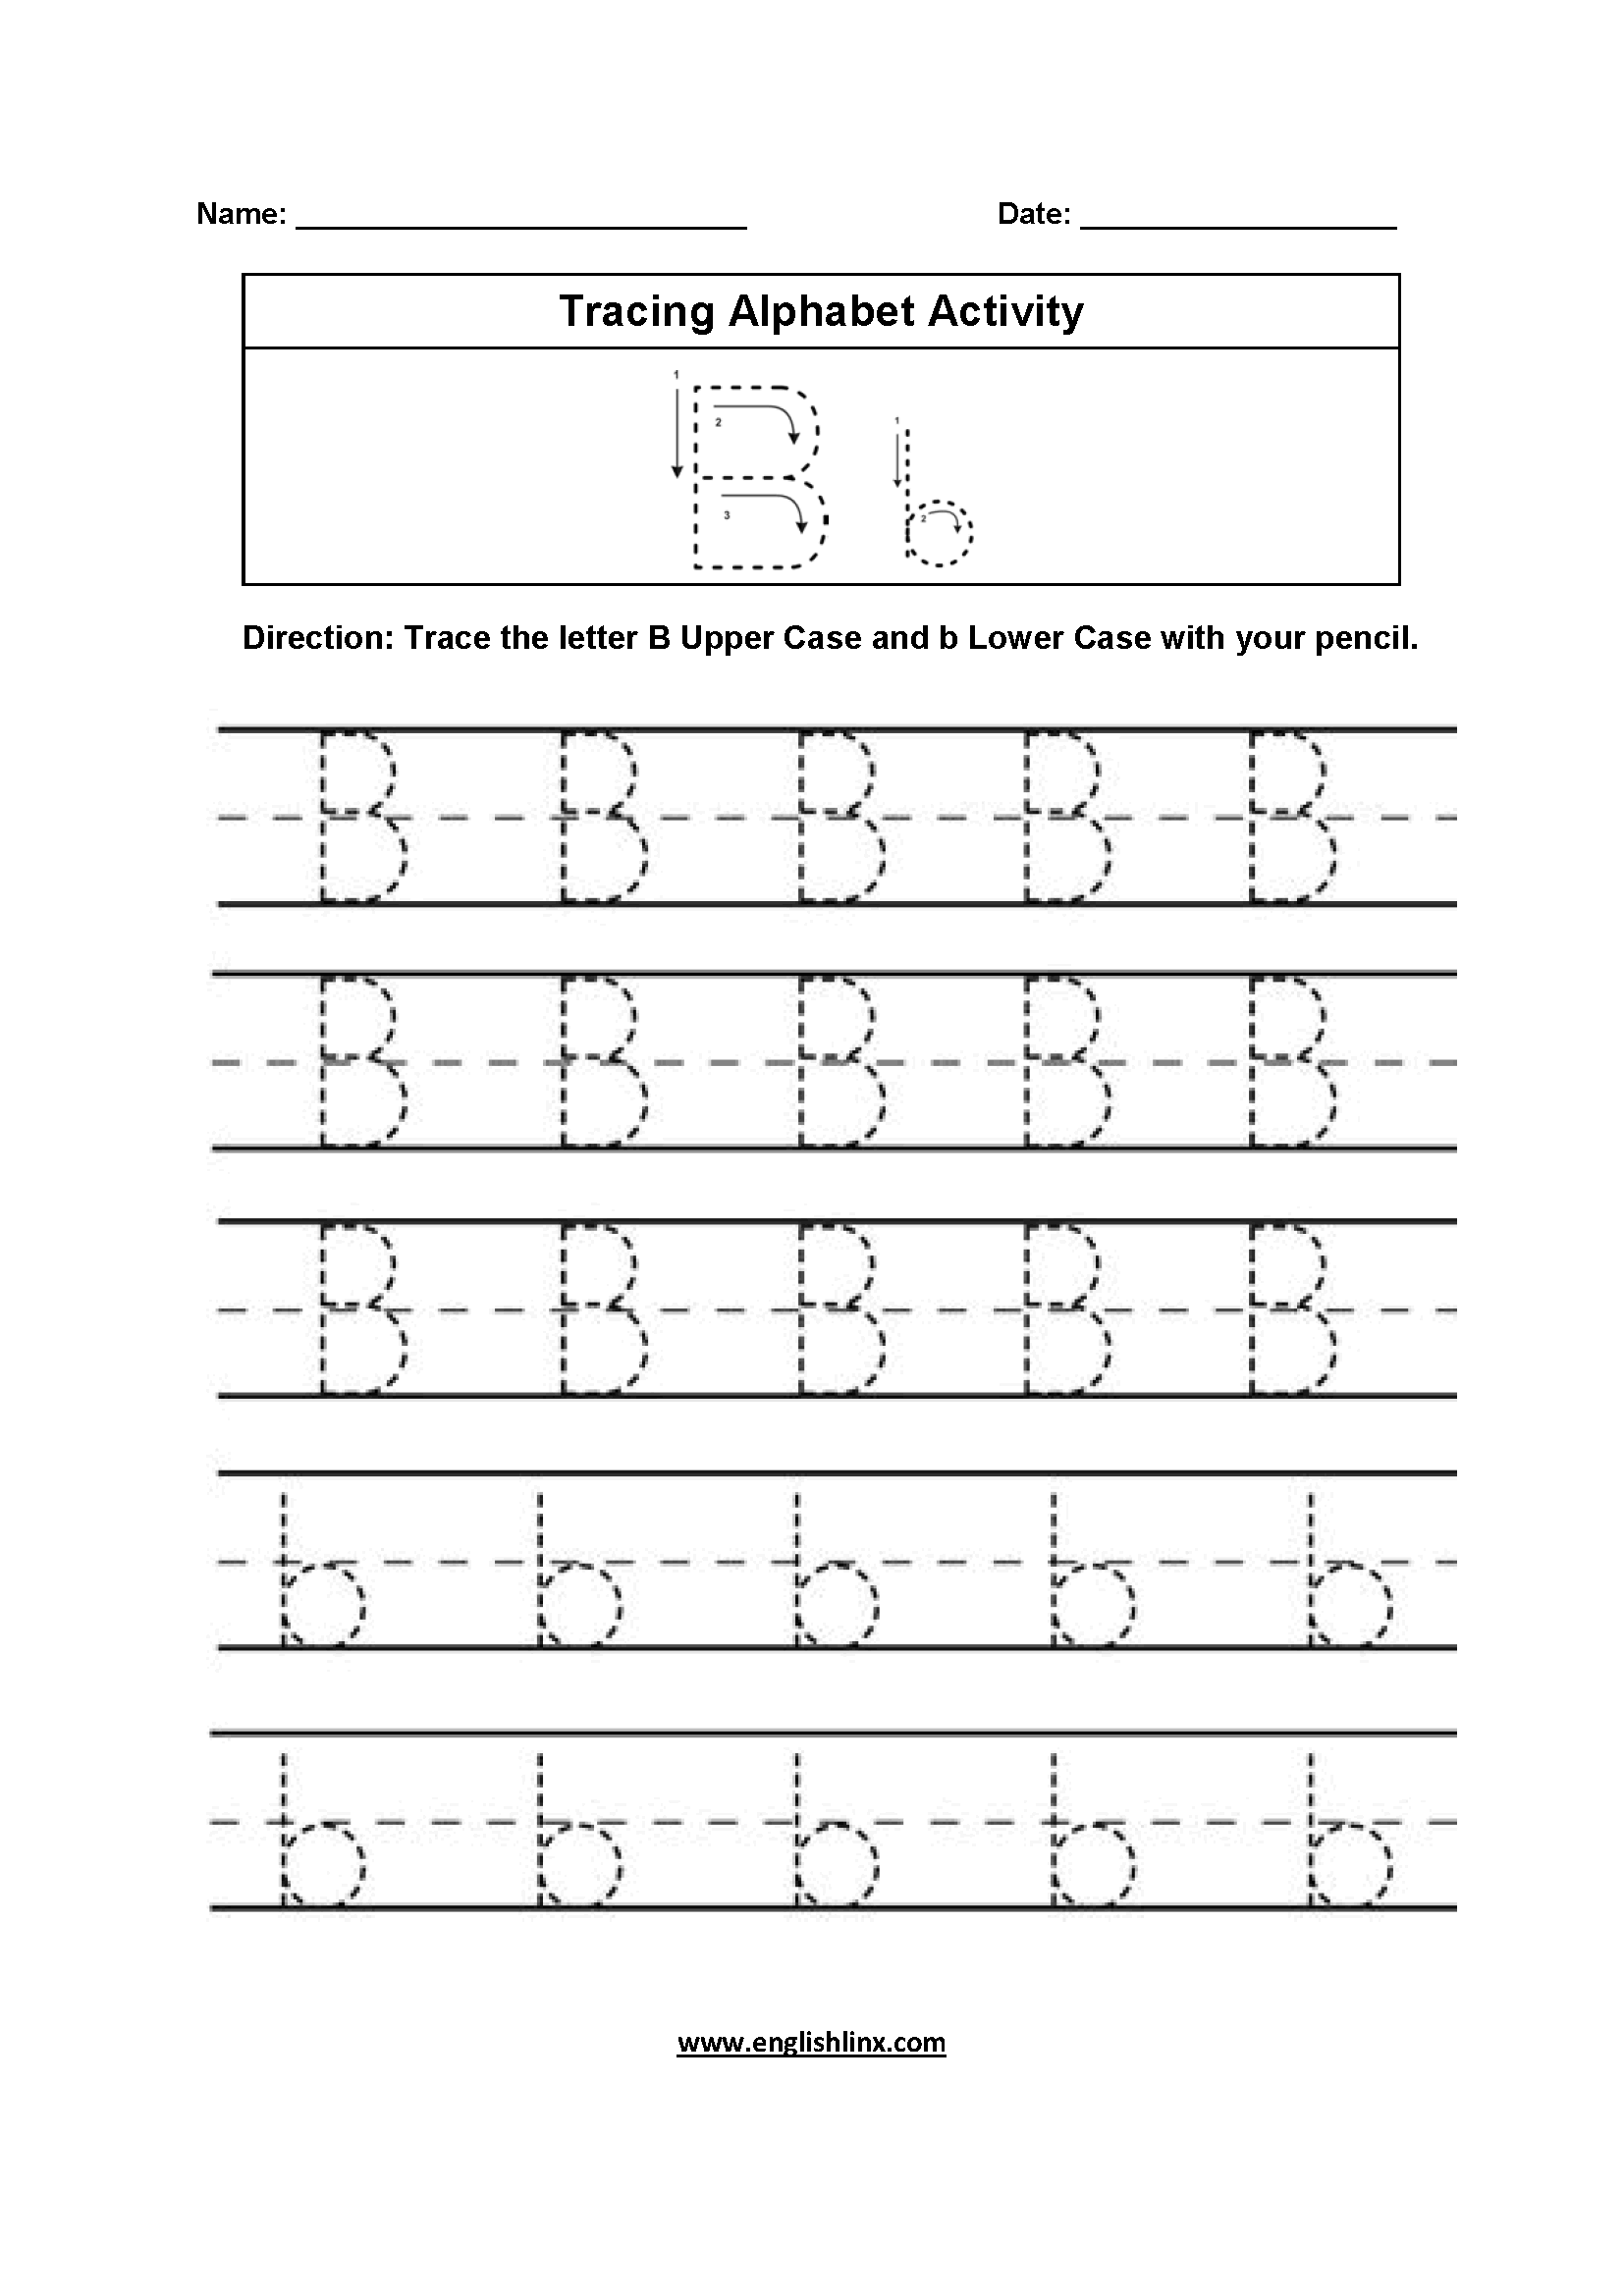 Worksheet ~ Worksheet Printable Alphabet Tracing Worksheets intended for B Letter Tracing Worksheet